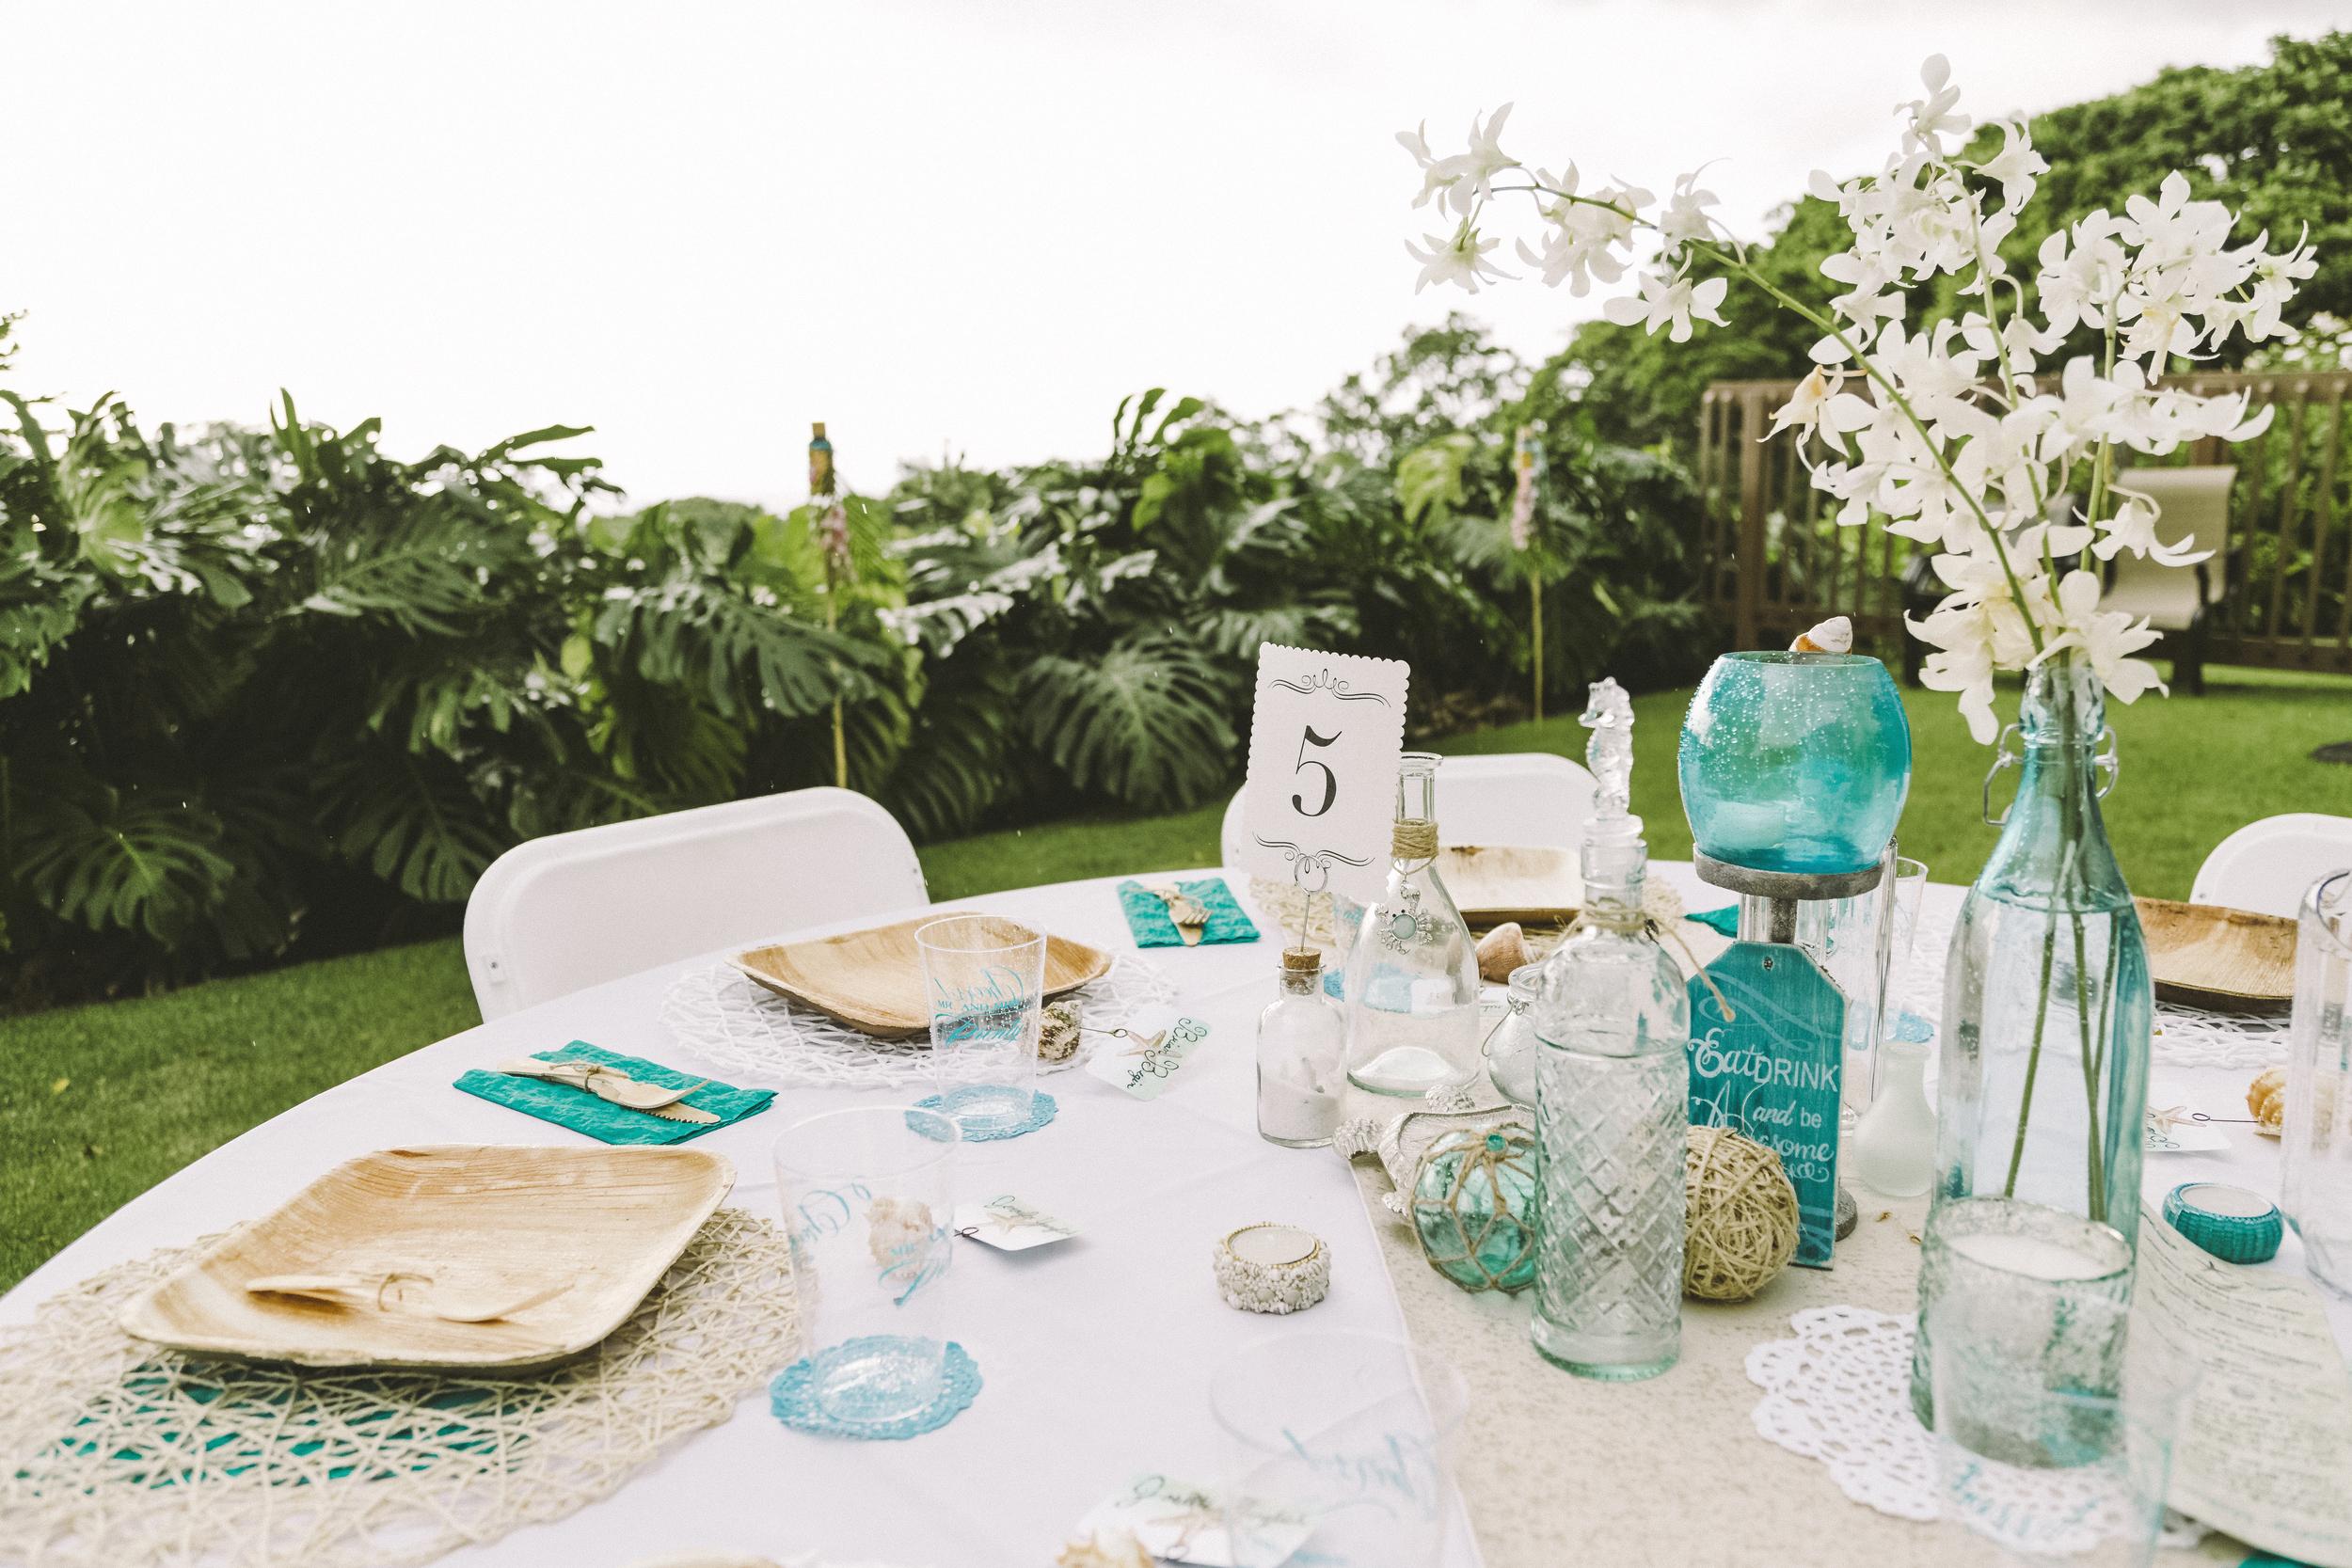 angie-diaz-photography-hawaii-wedding-photographer-kelli-jay-100.jpg